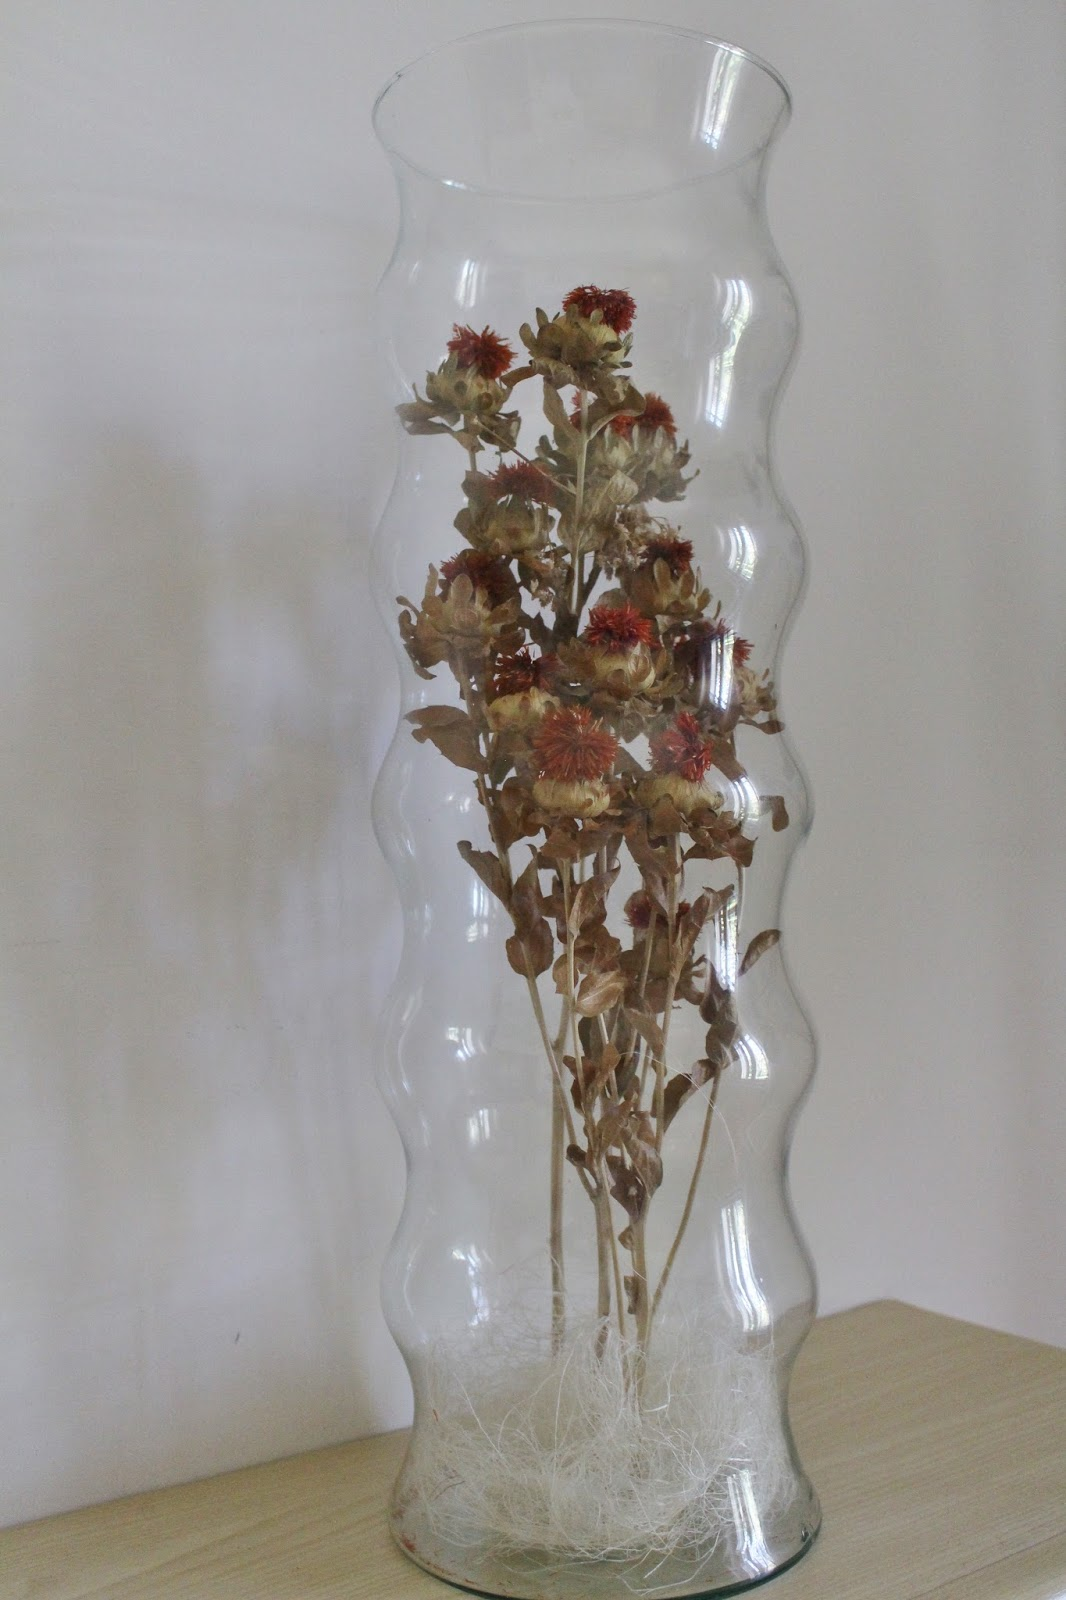 La granja di adriana fiori secchi in vasi di vetro for Vasi ermetici vetro